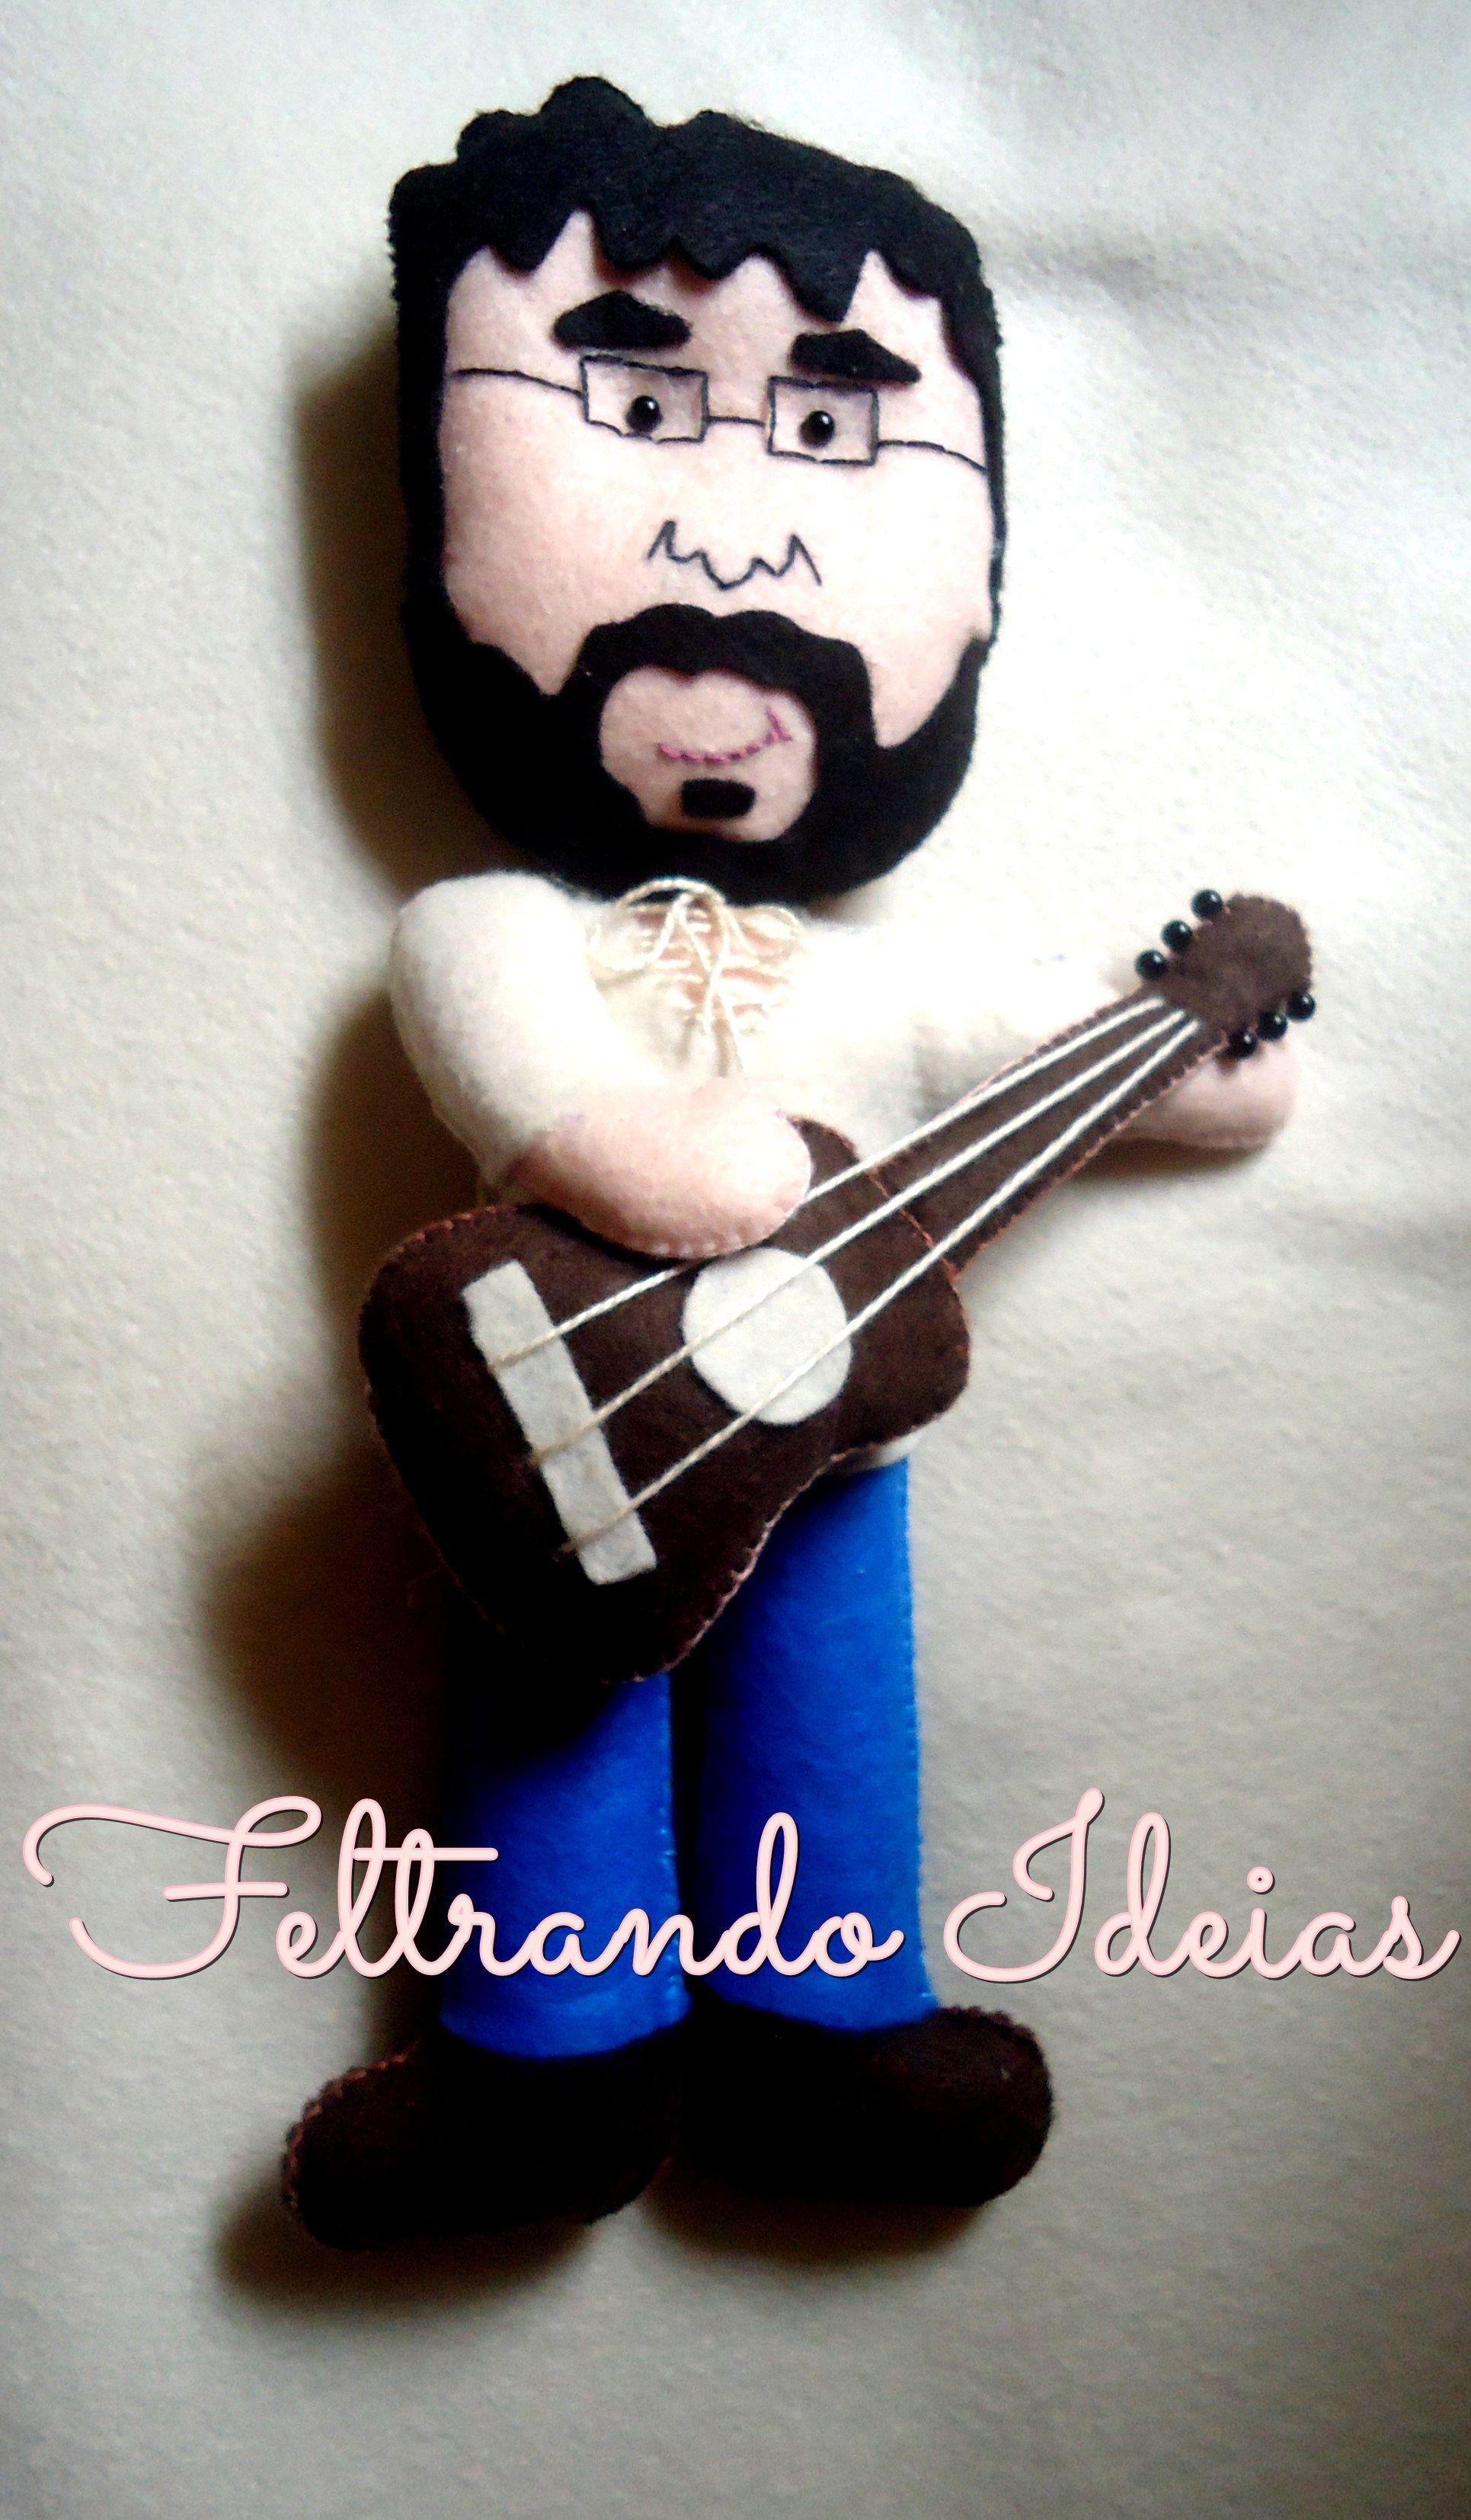 Renato Russo Feltrando Ideias on facebook